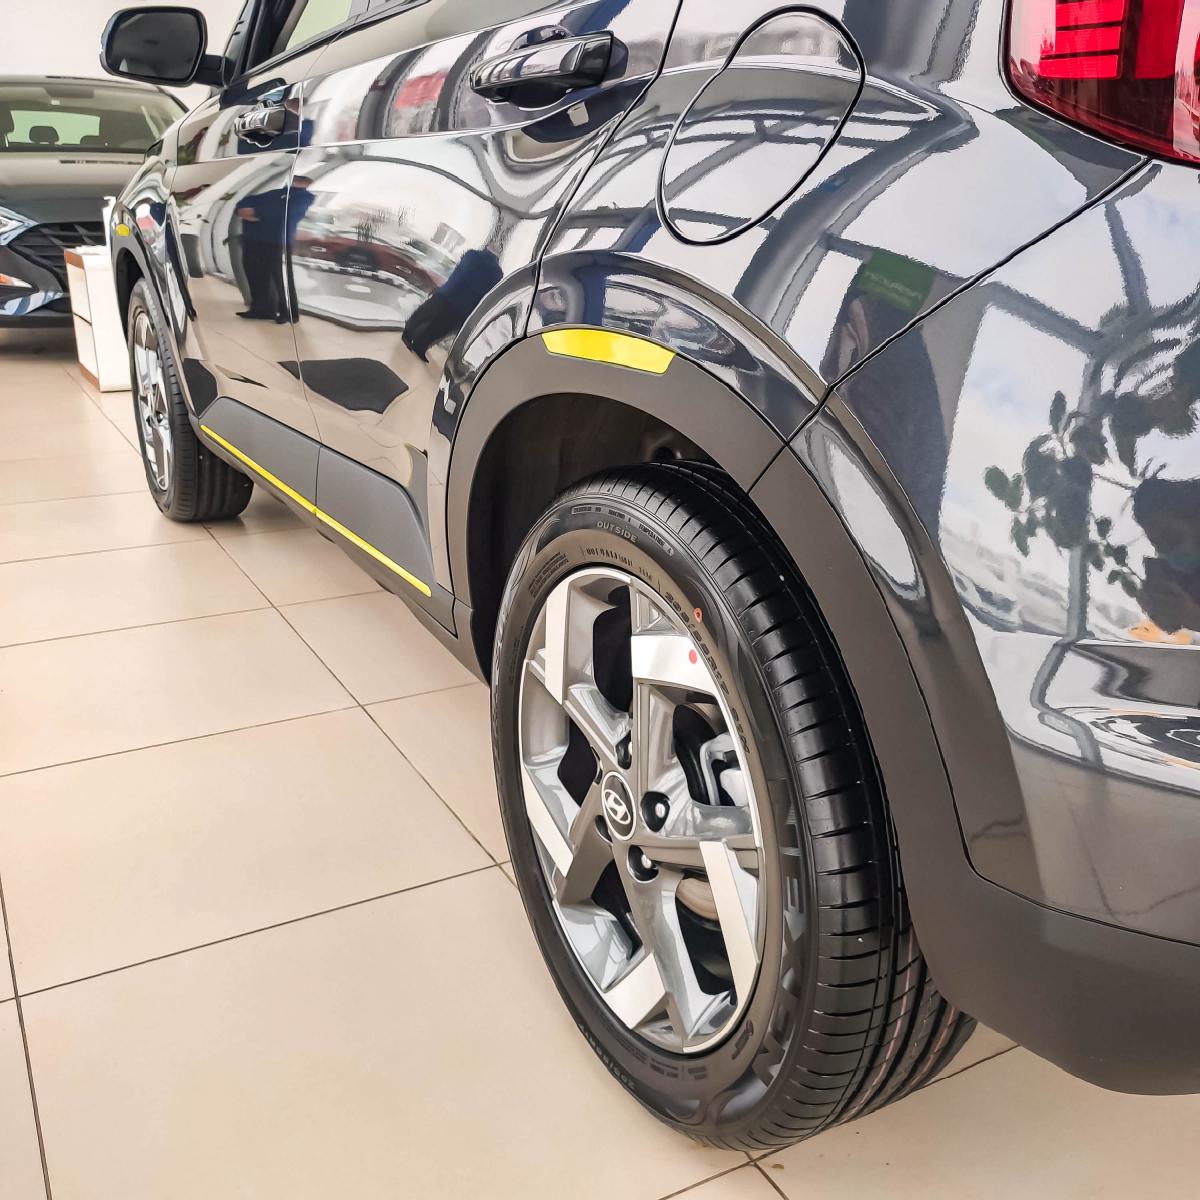 Абсолютно новий компактний міський кросовер Hyundai Venue | Хюндай Мотор Україна - фото 10